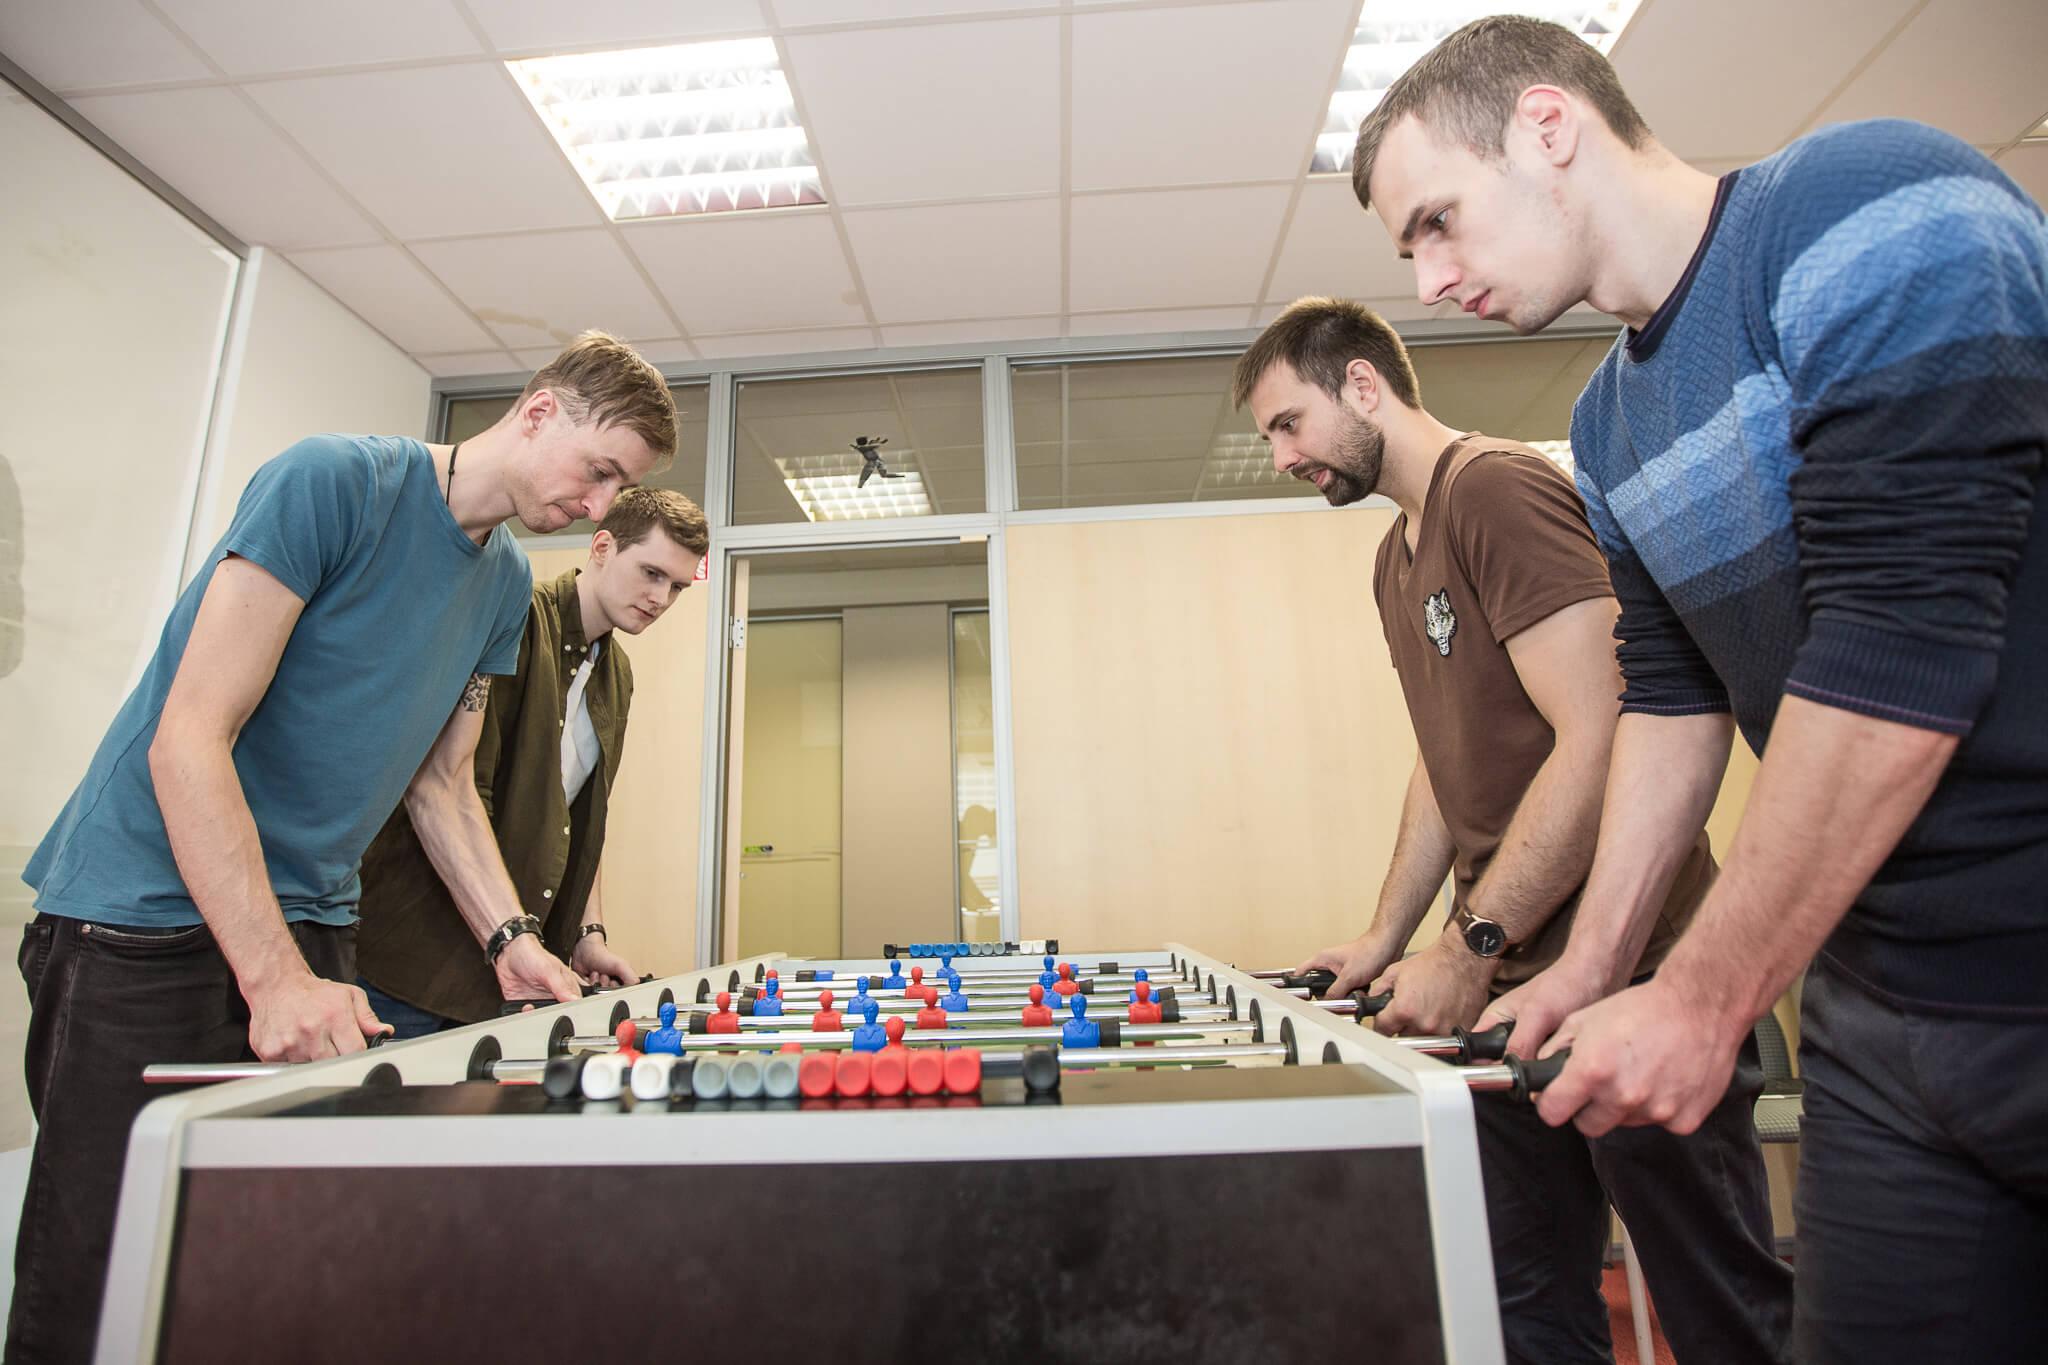 E-Bros team playing foosball